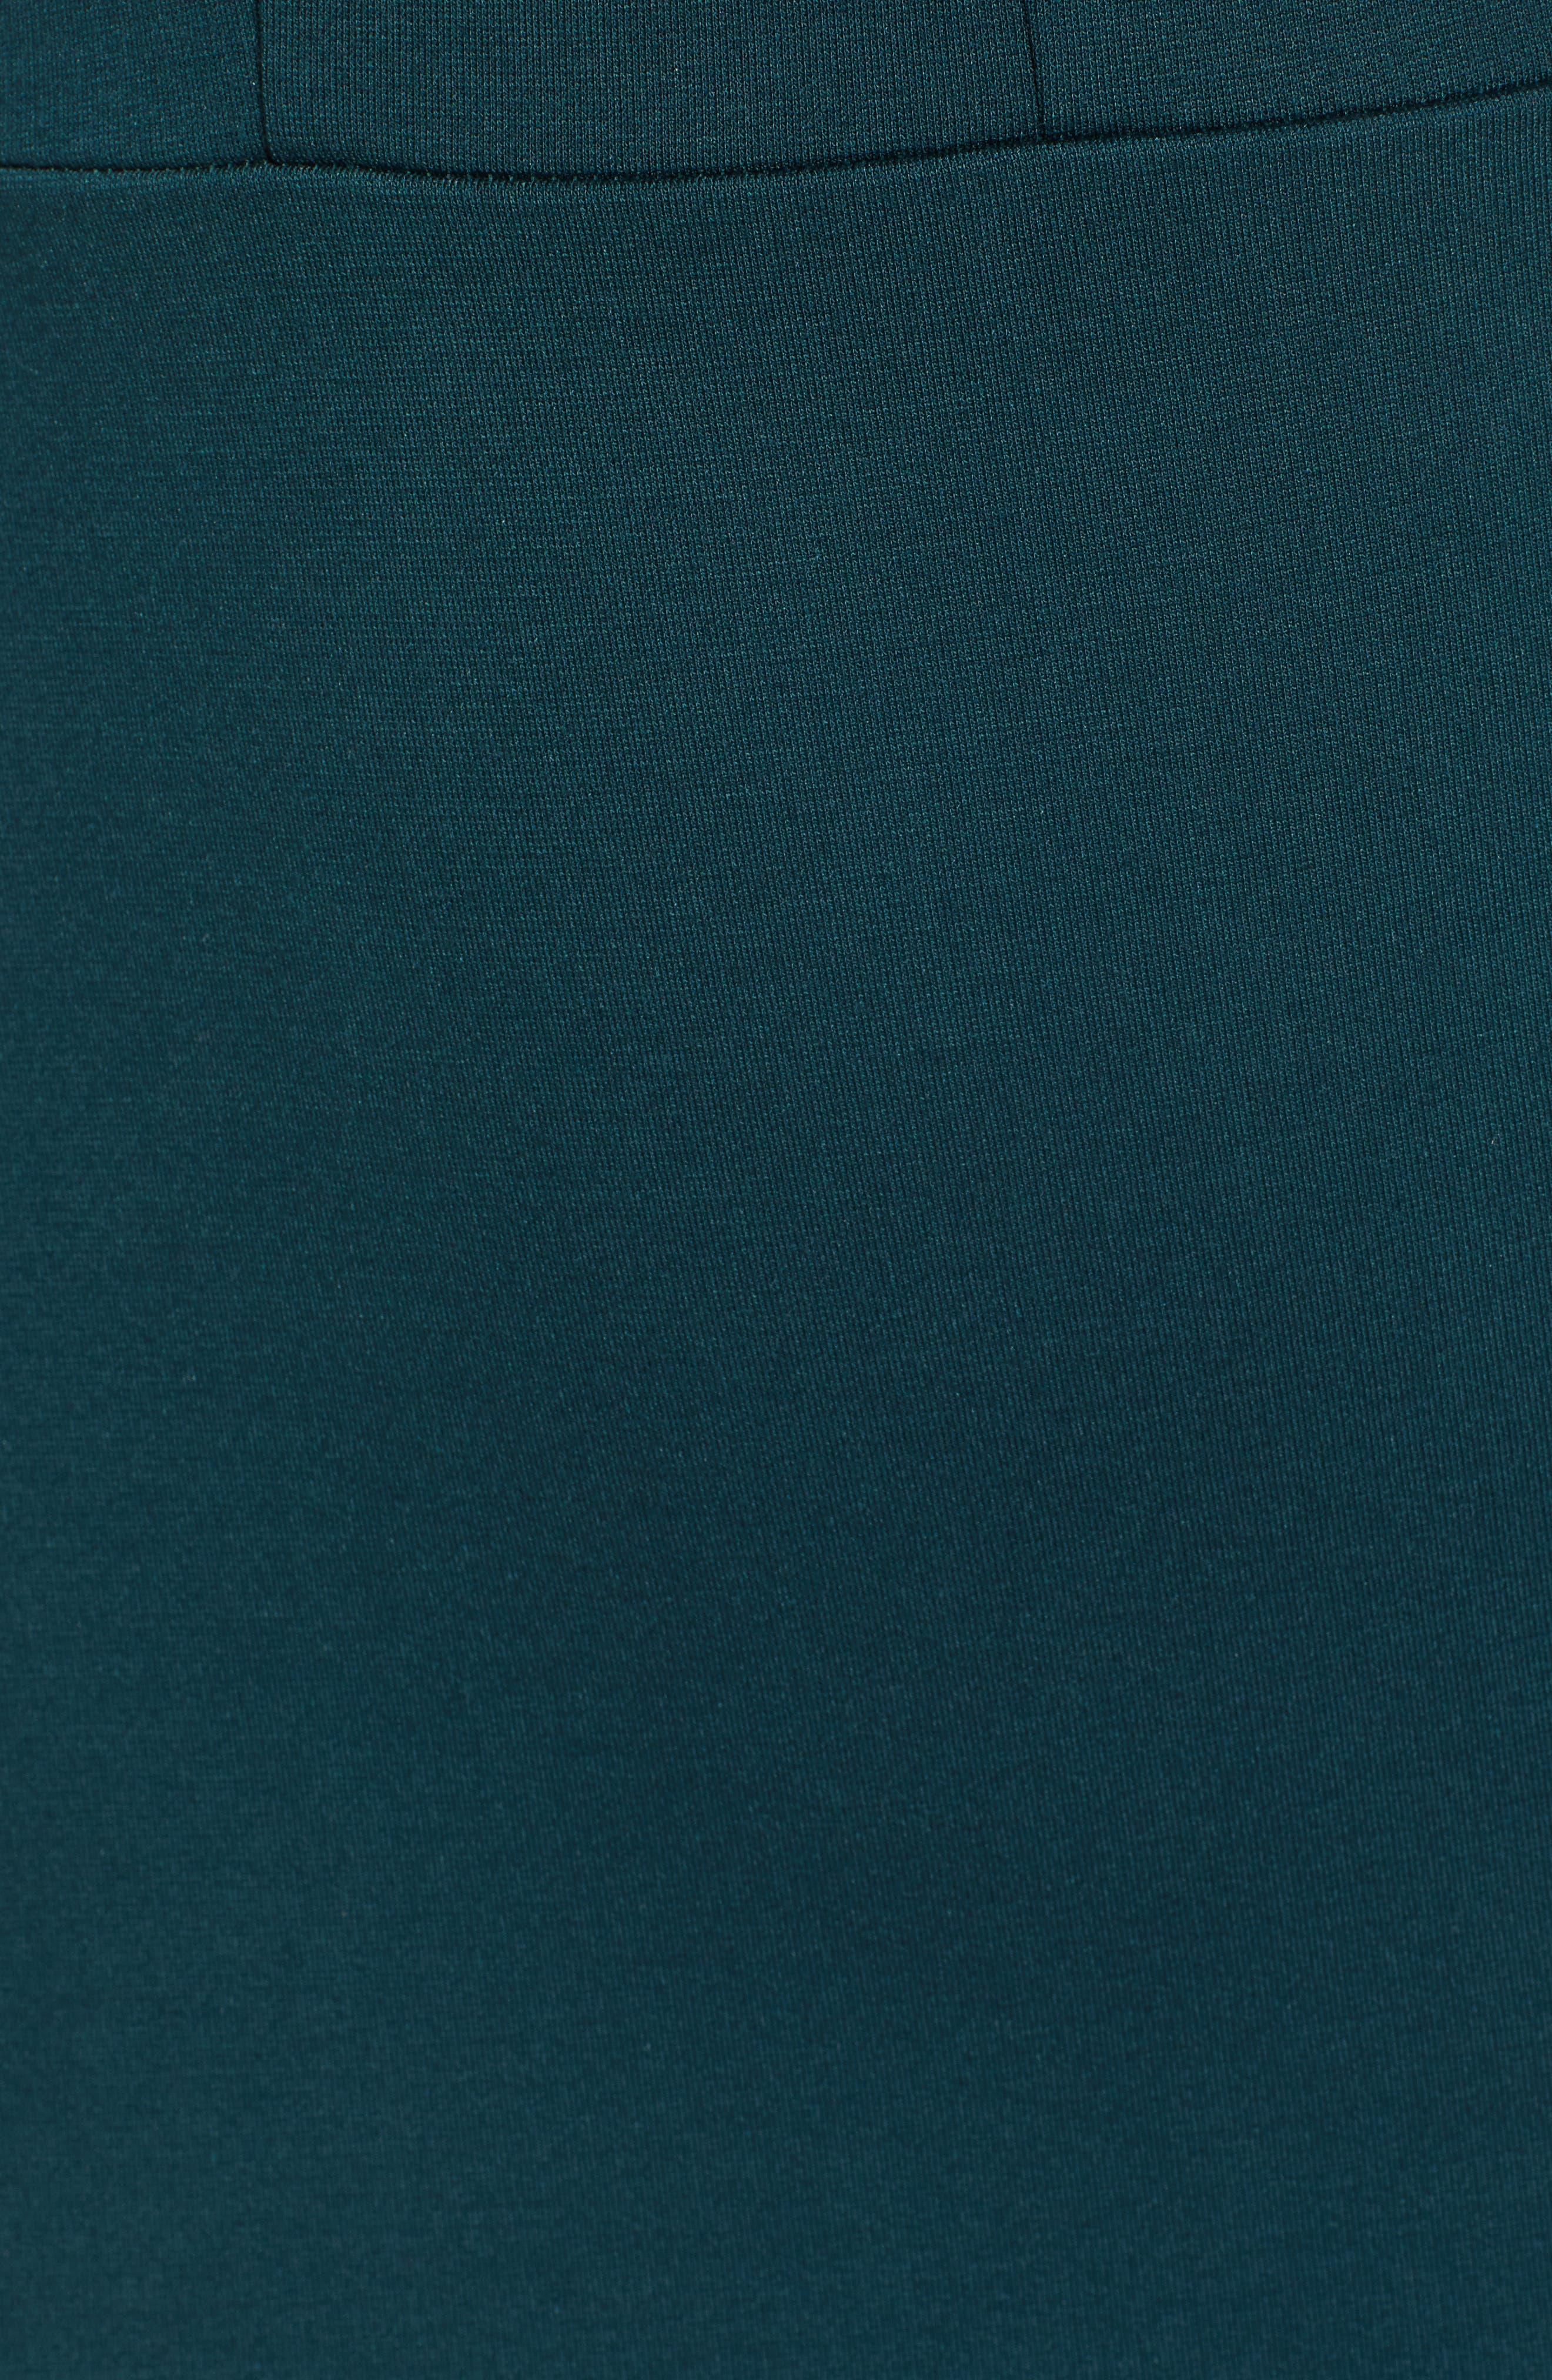 Body-Con Dress,                             Alternate thumbnail 6, color,                             GREEN BUG